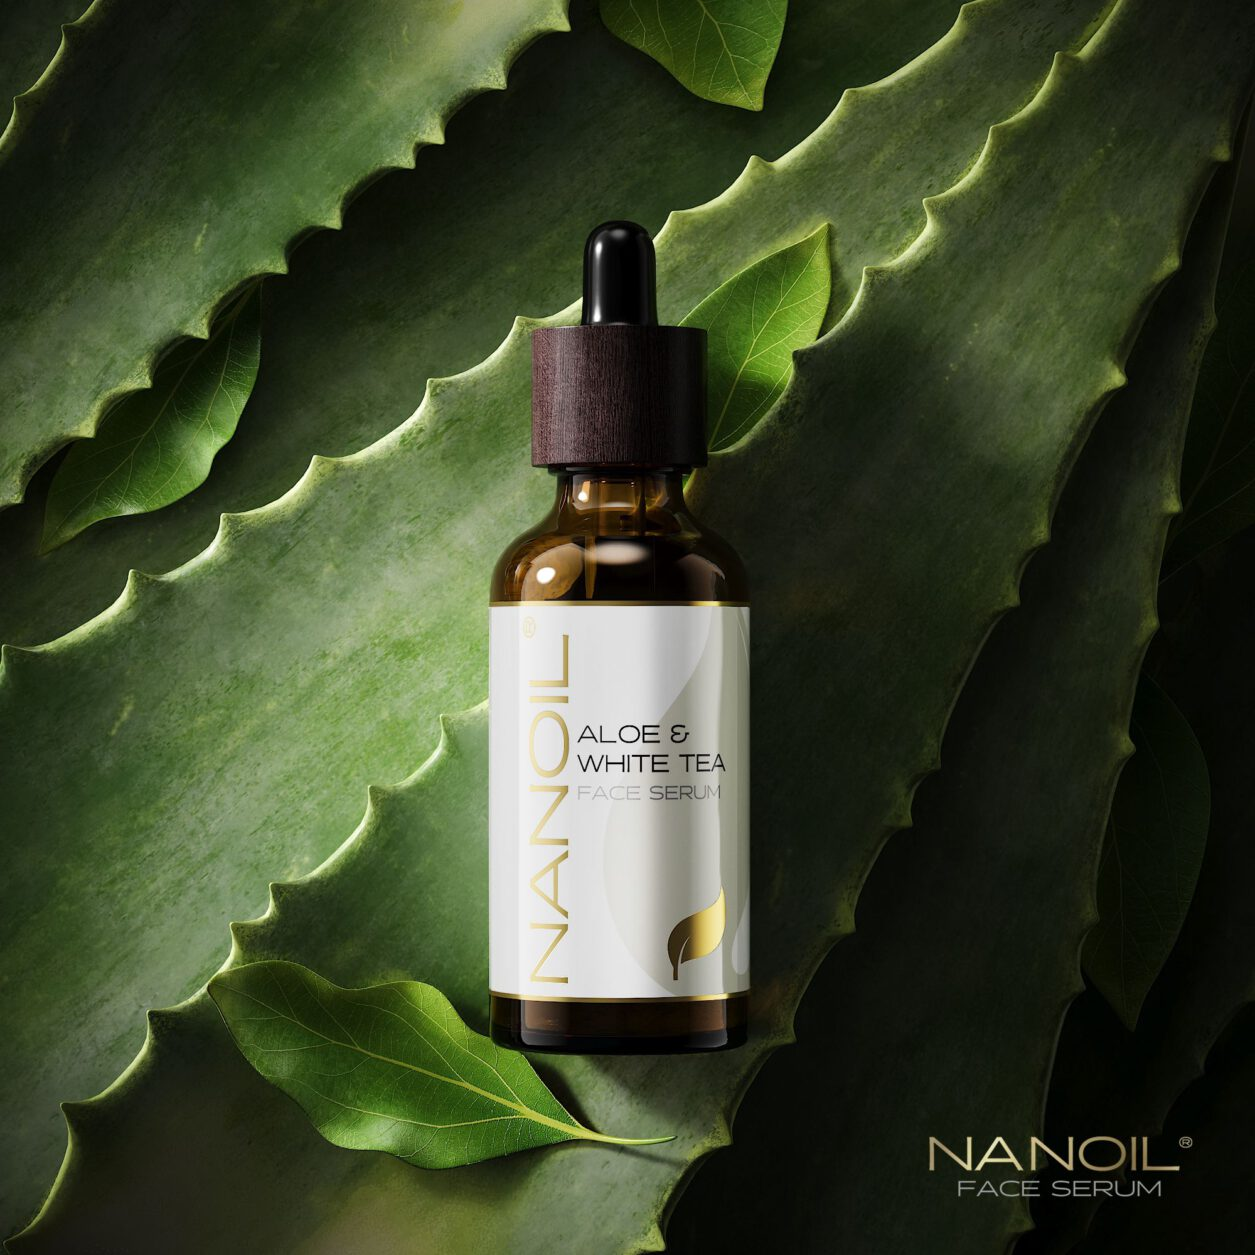 nanoil aloe vera and white tea face serum